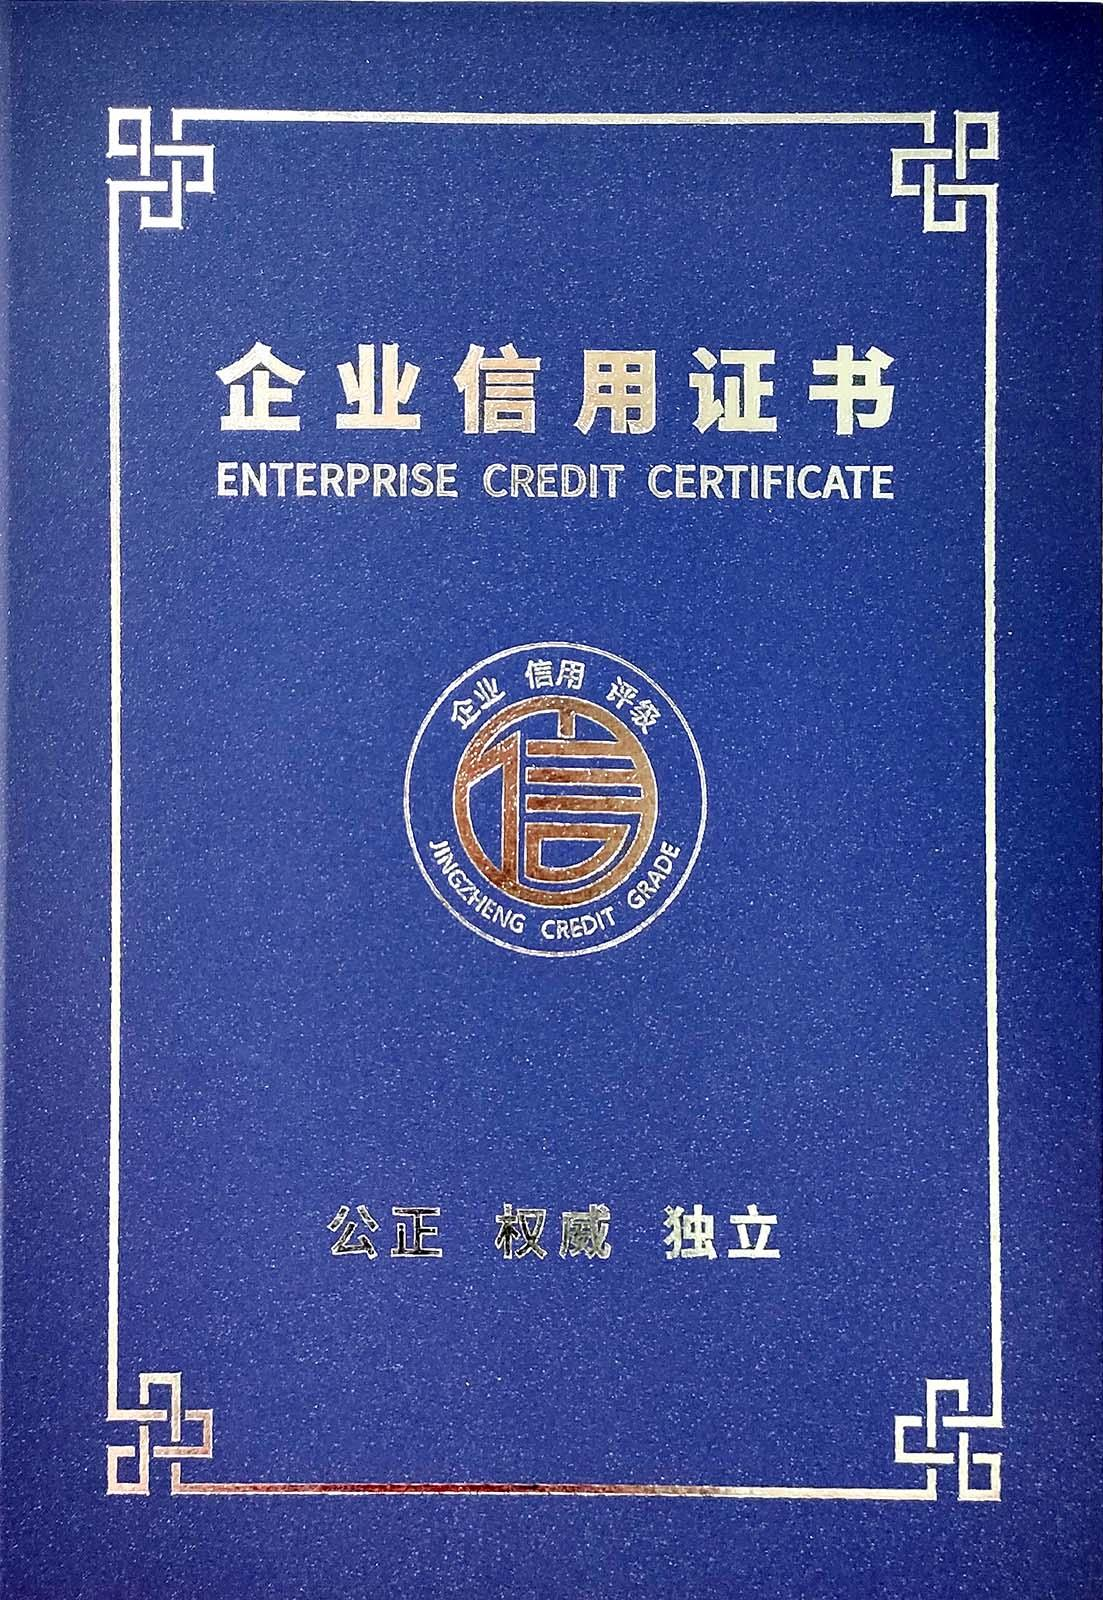 Enterprise Credit Certificate